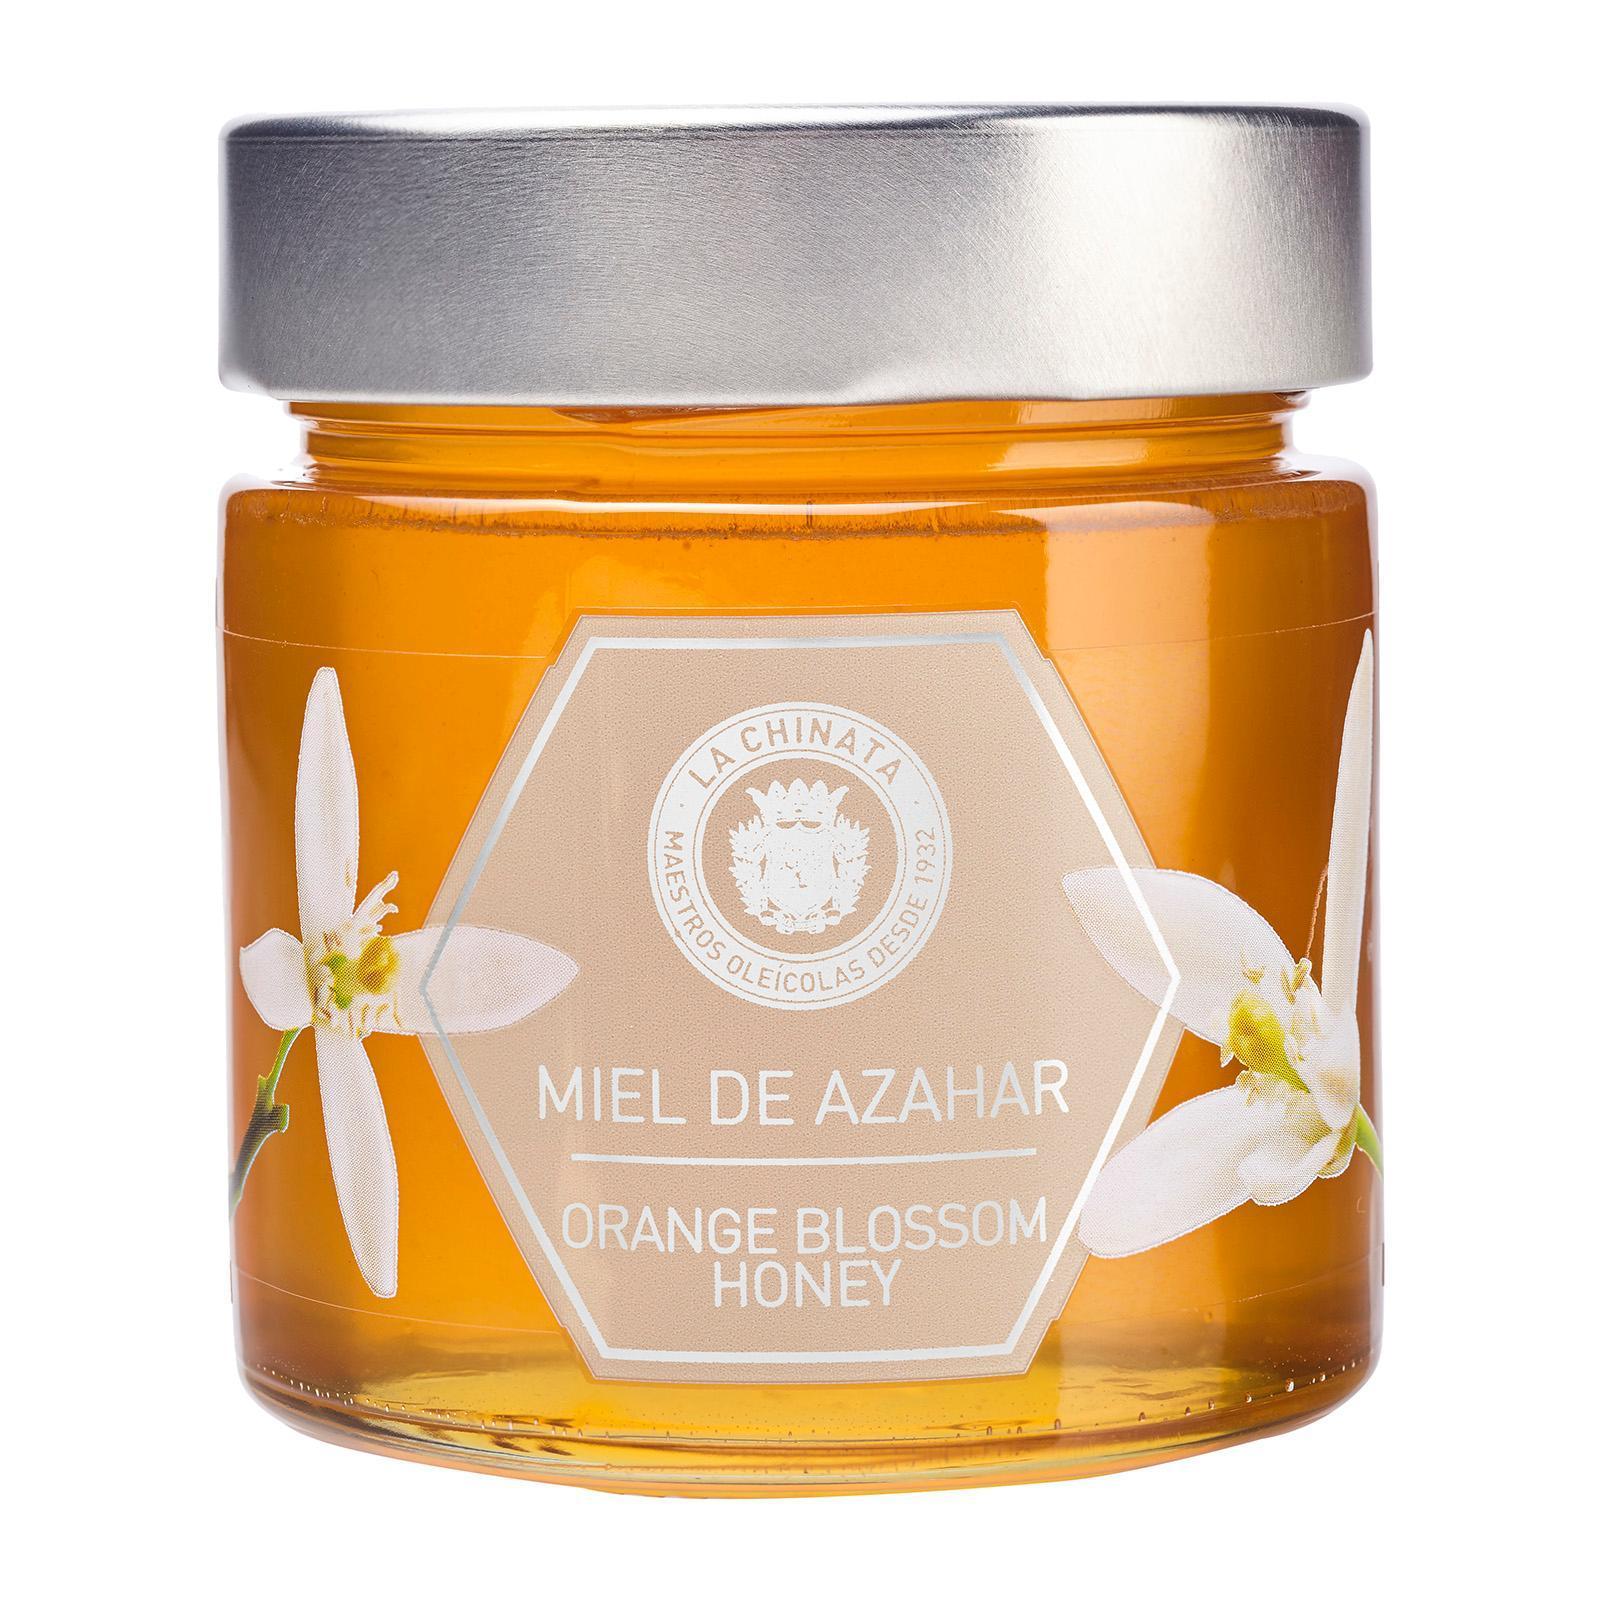 La Chinata Spanish Orange Blossom Honey - By TANINOS